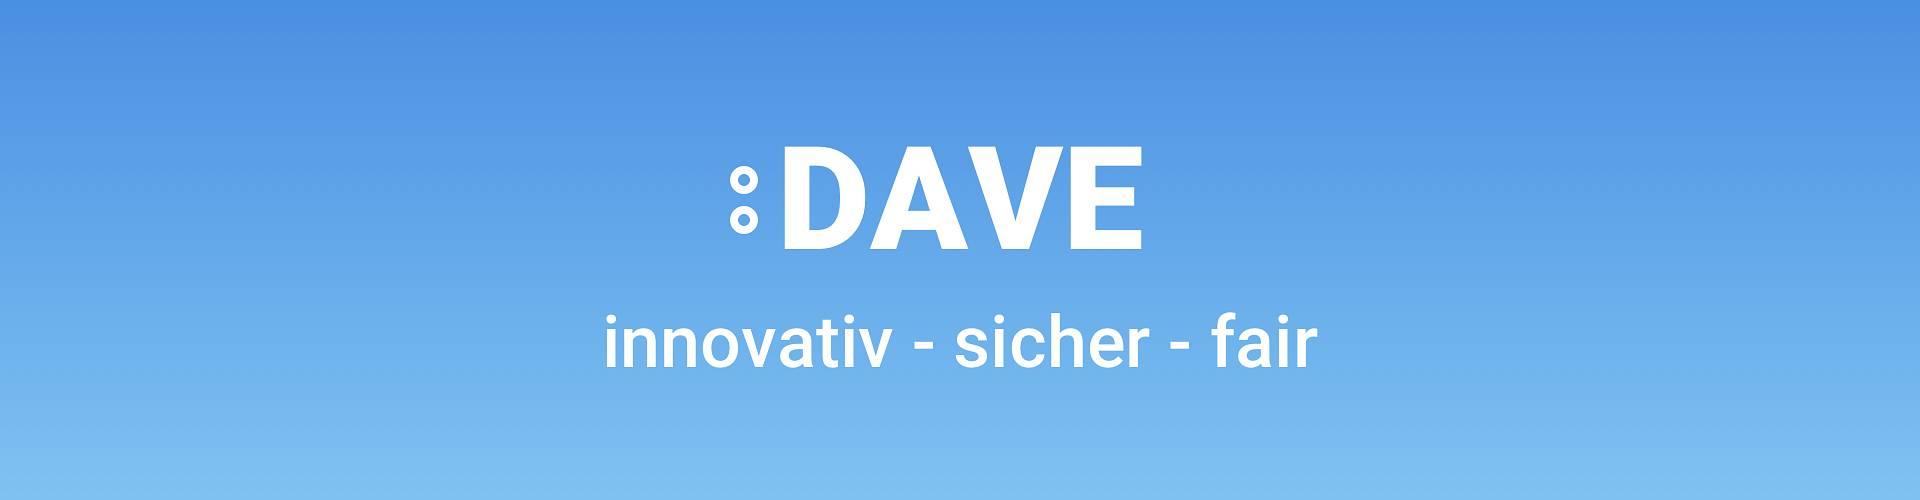 DAVE - innovativ - sicher - fair DAVE - innovativ - sicher - fair